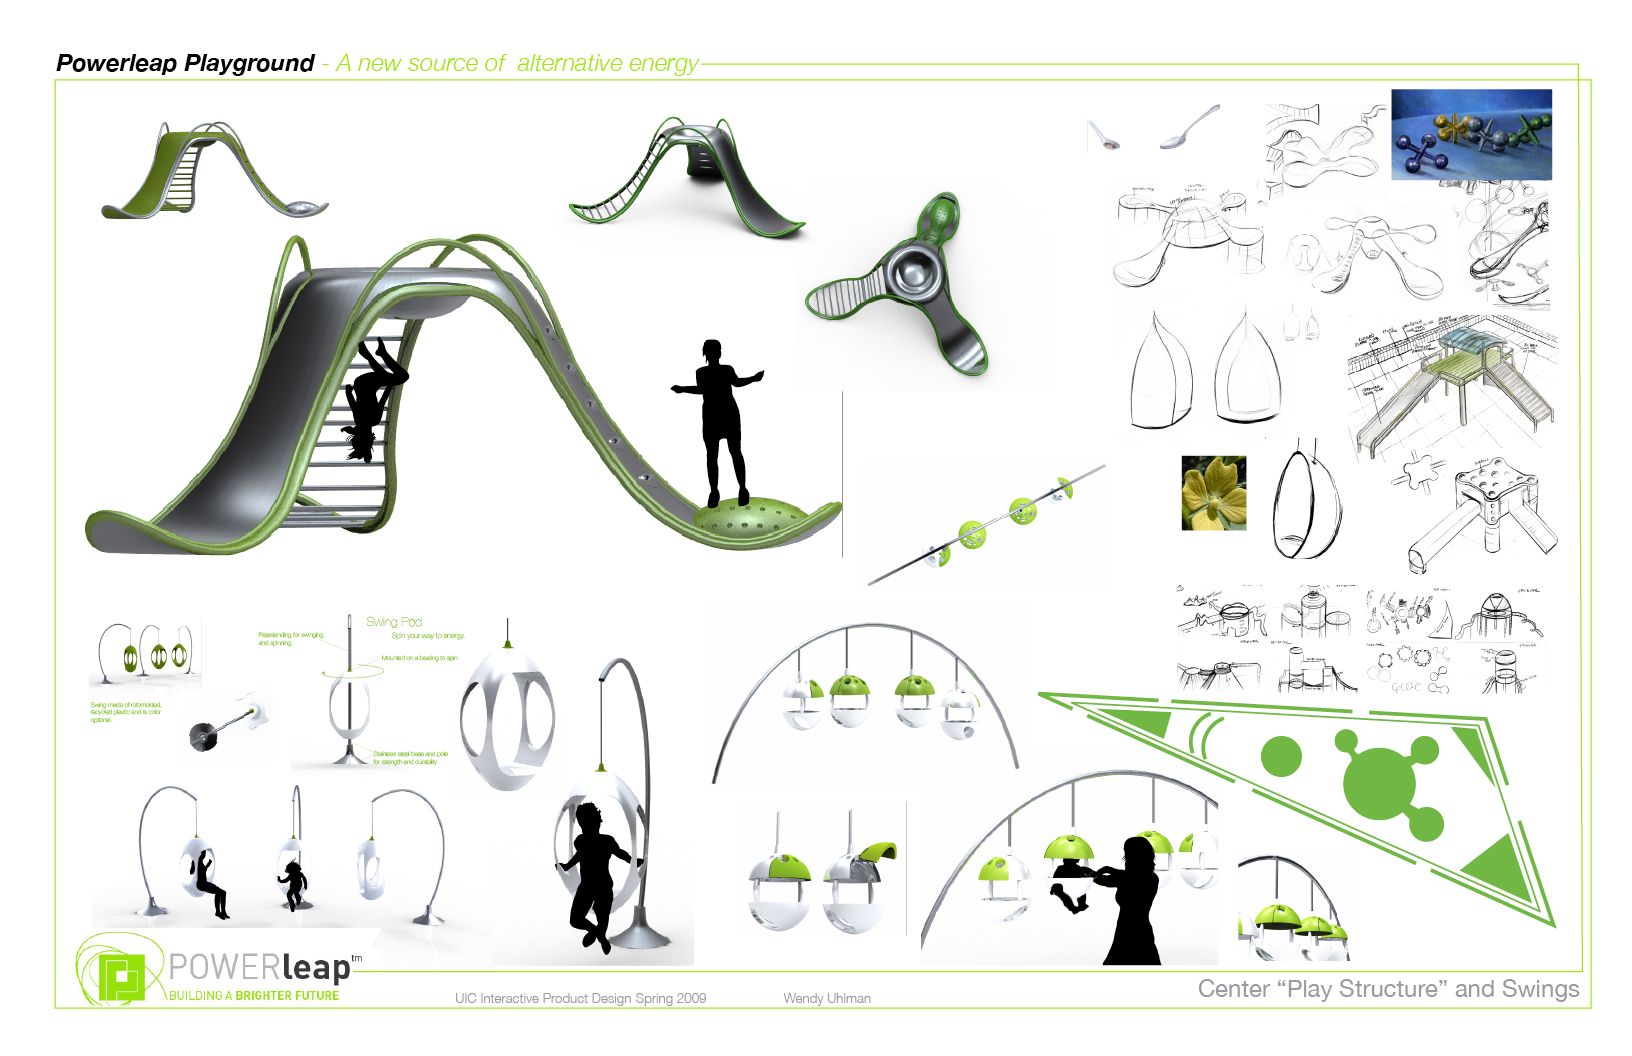 powerleap playground by wendy uhlman at coroflot com